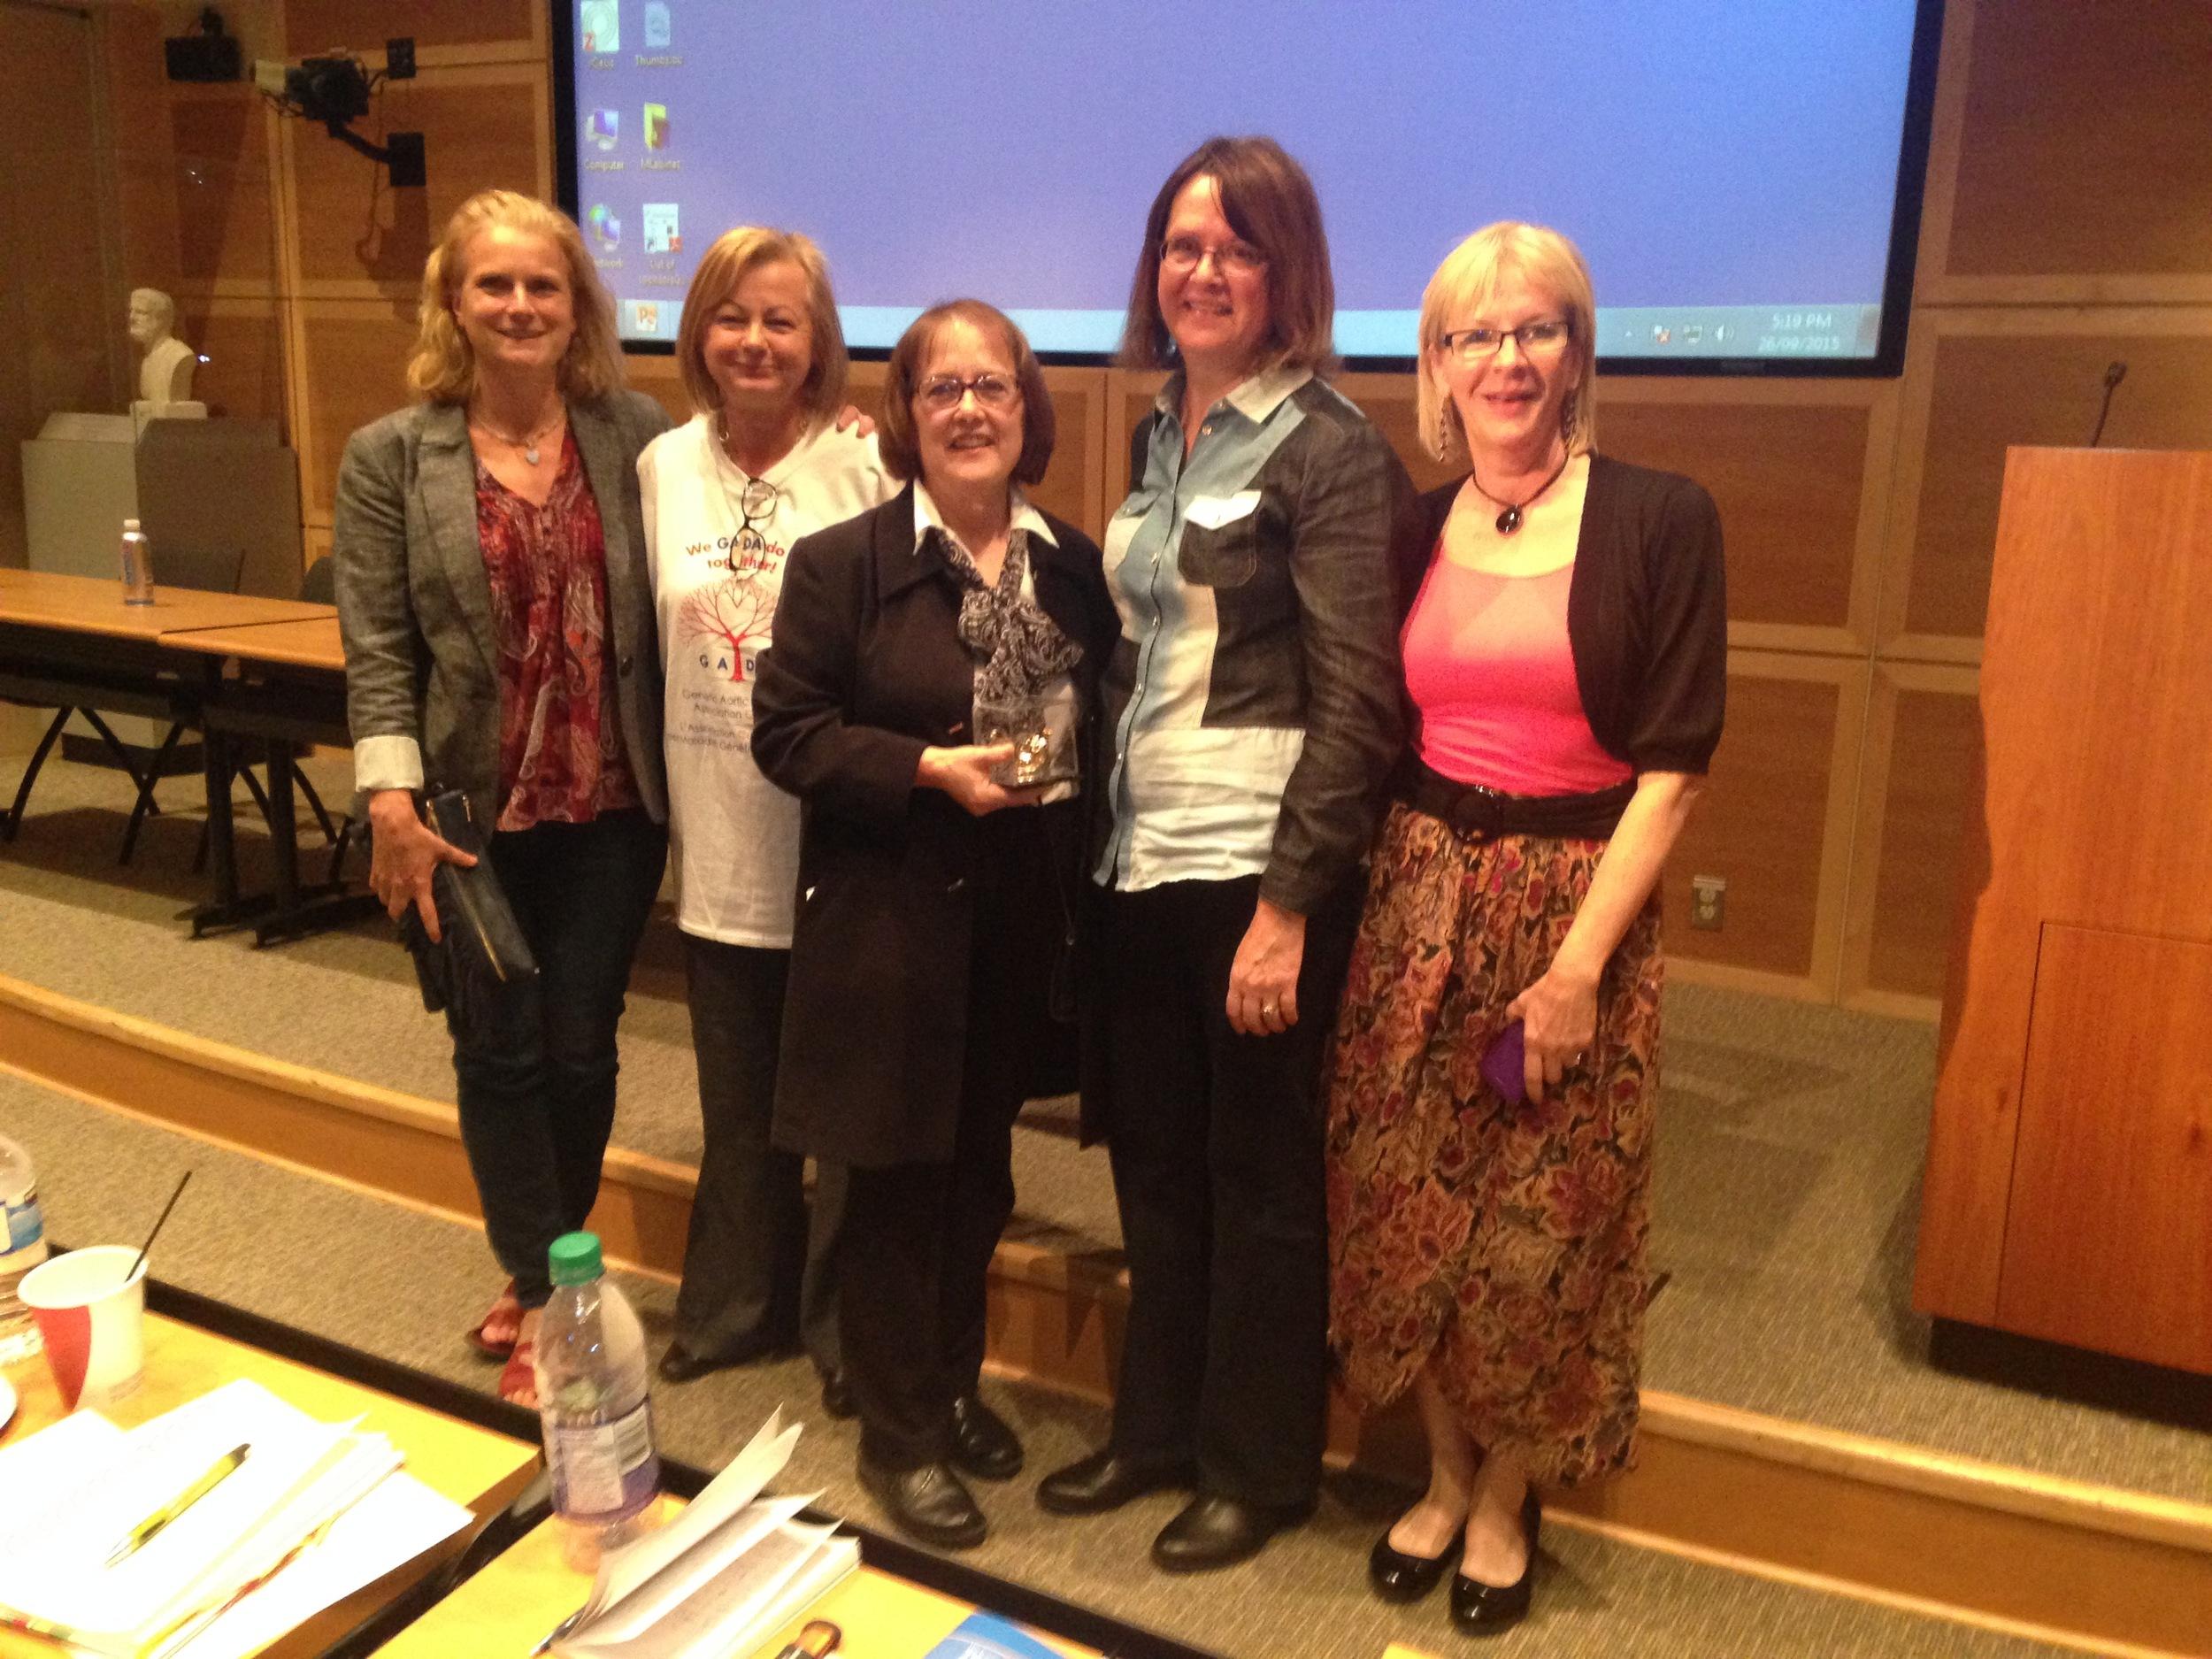 Suzanne Drouin (Center) - Awarded Elizabeth McHenry Volunteer Award by GADA Canada